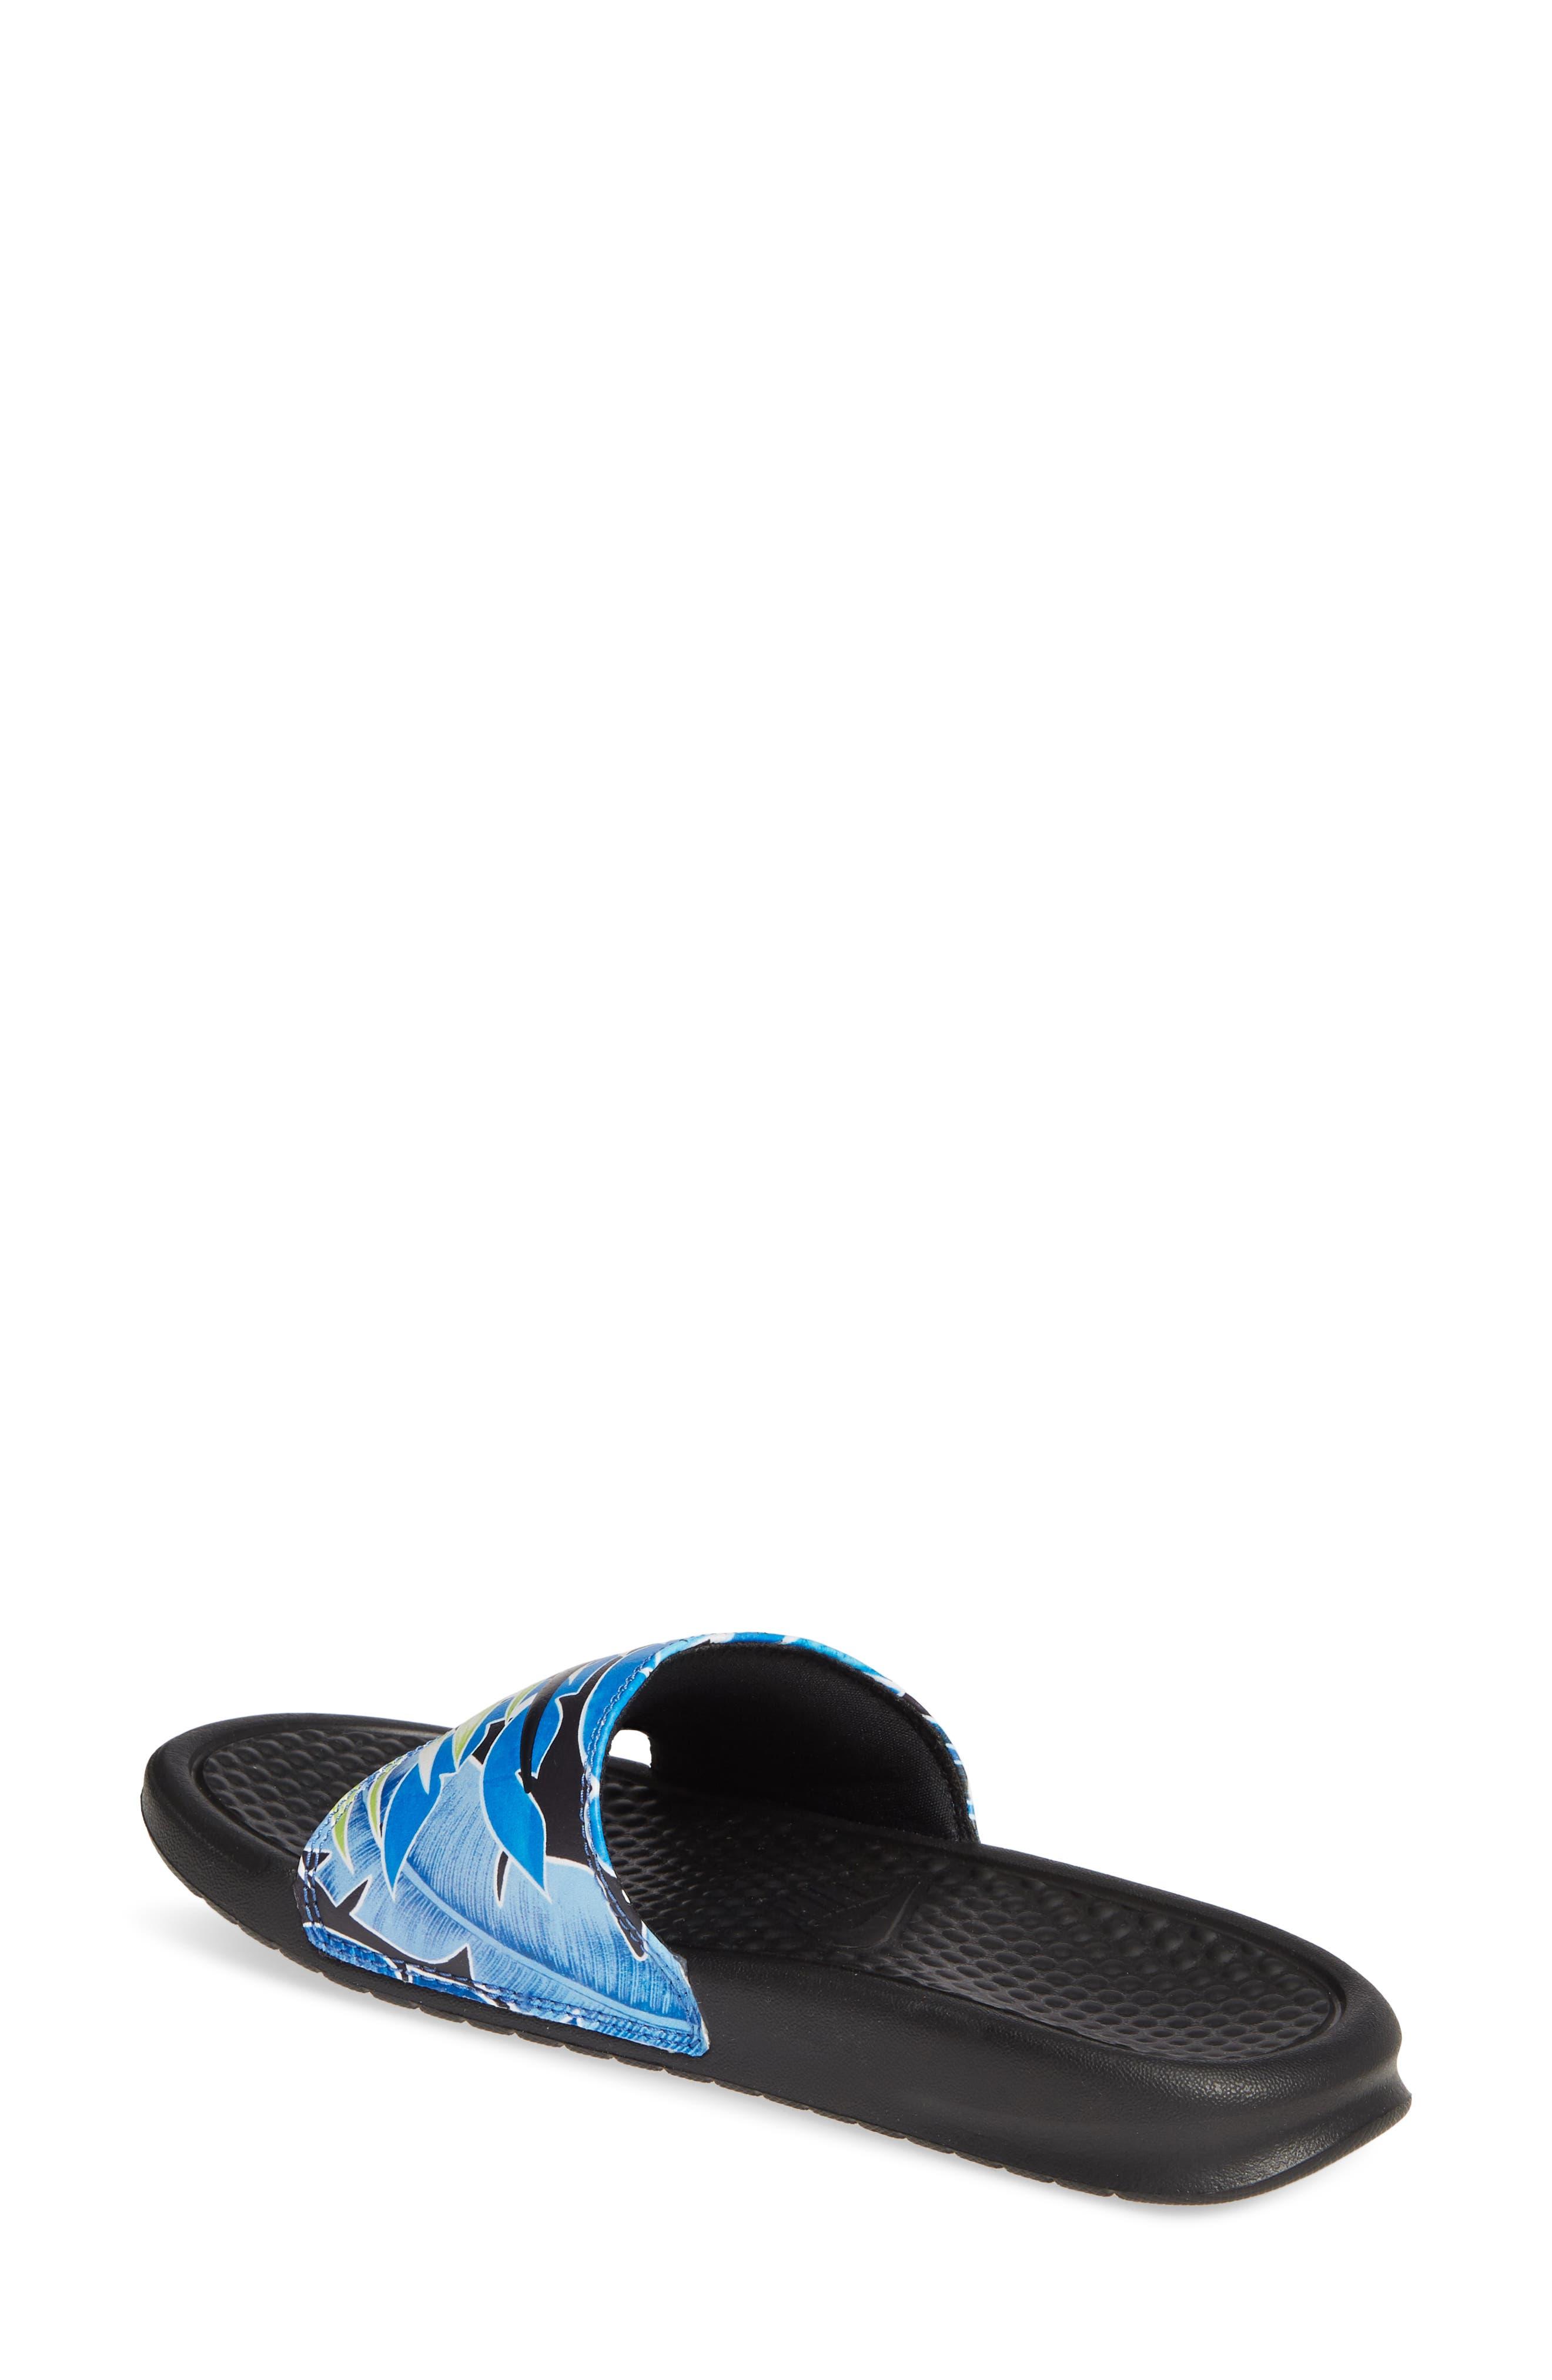 703c6dac719 Women s Pool Slide Sandals